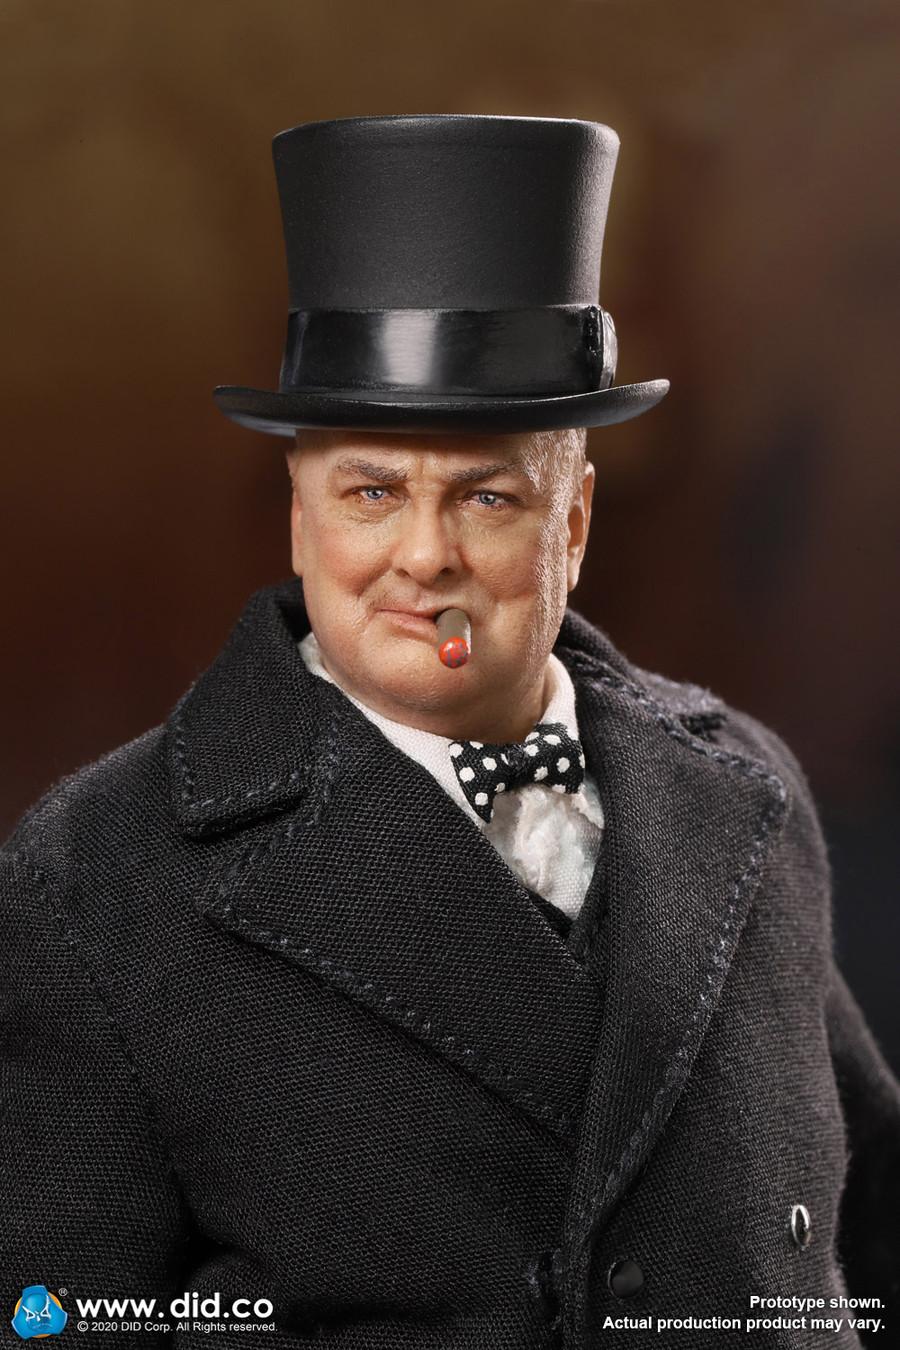 DID - 1/12 Palm Hero - Prime Minister of United Kingdom - Winston Churchill